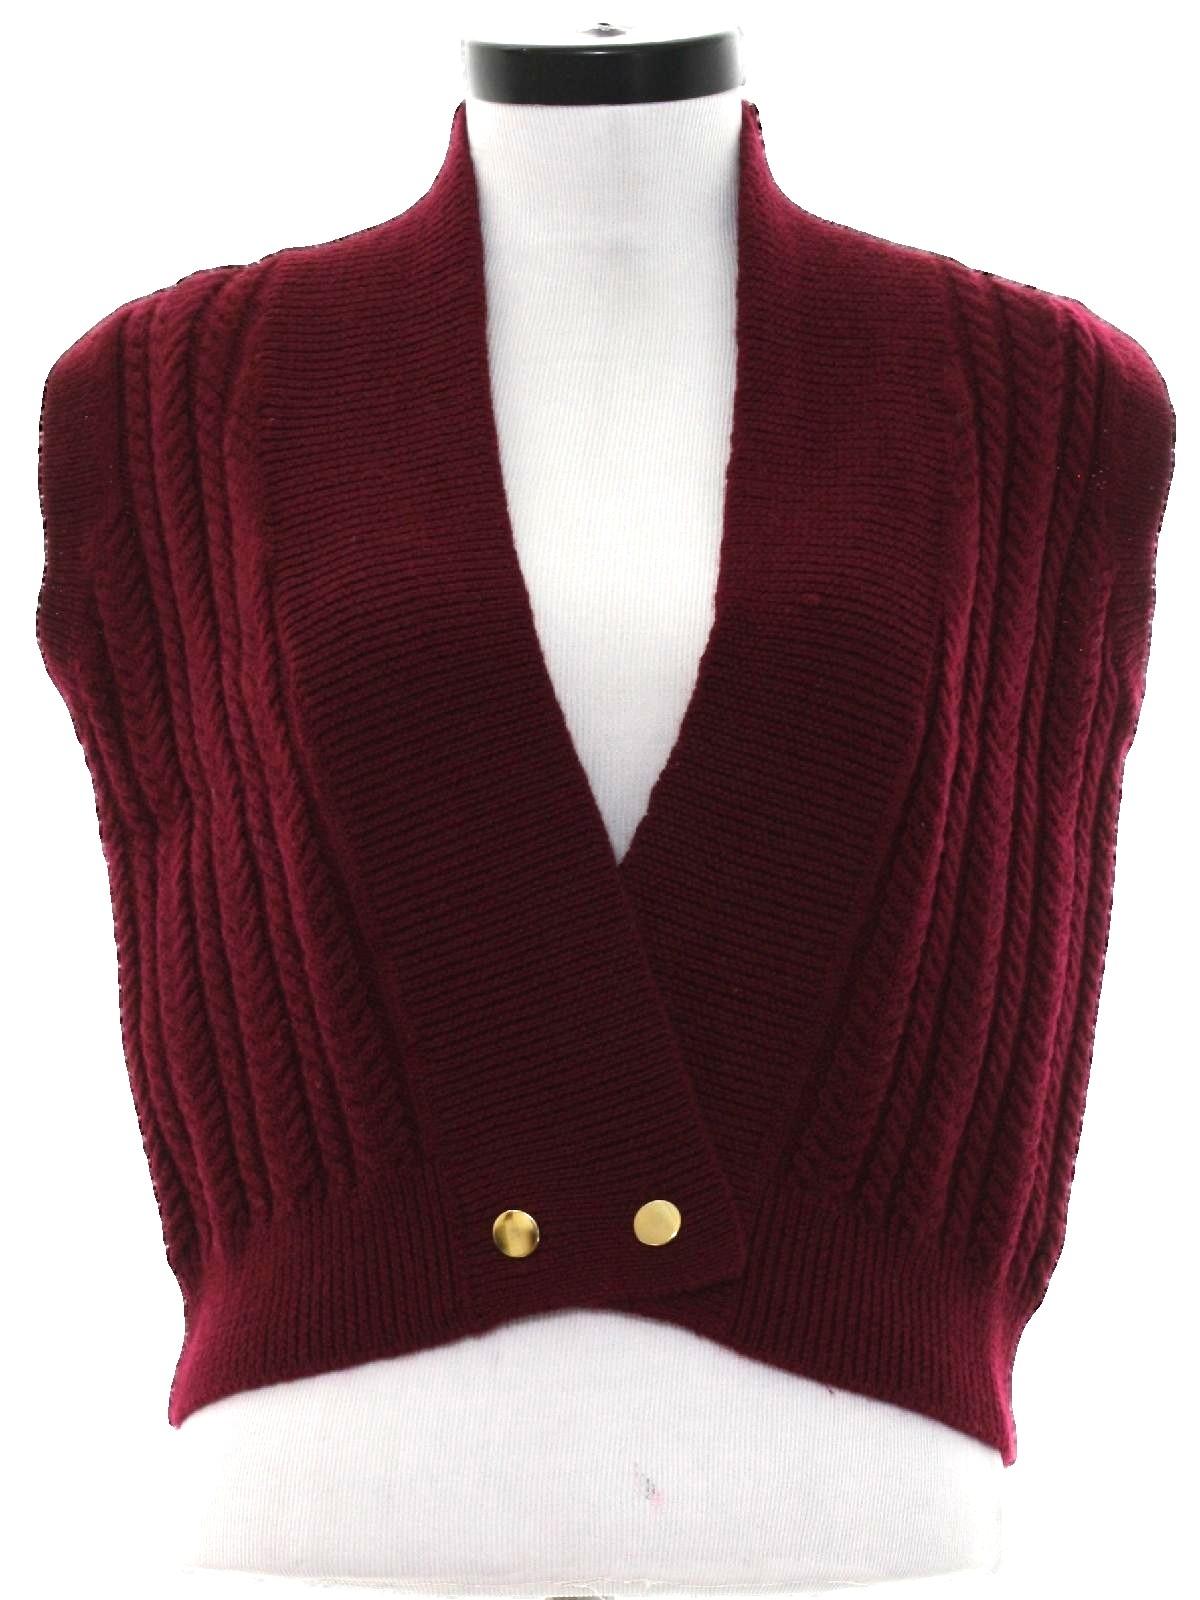 80's fabric label Sweater: Late 80s -fabric label- Womens dark ...